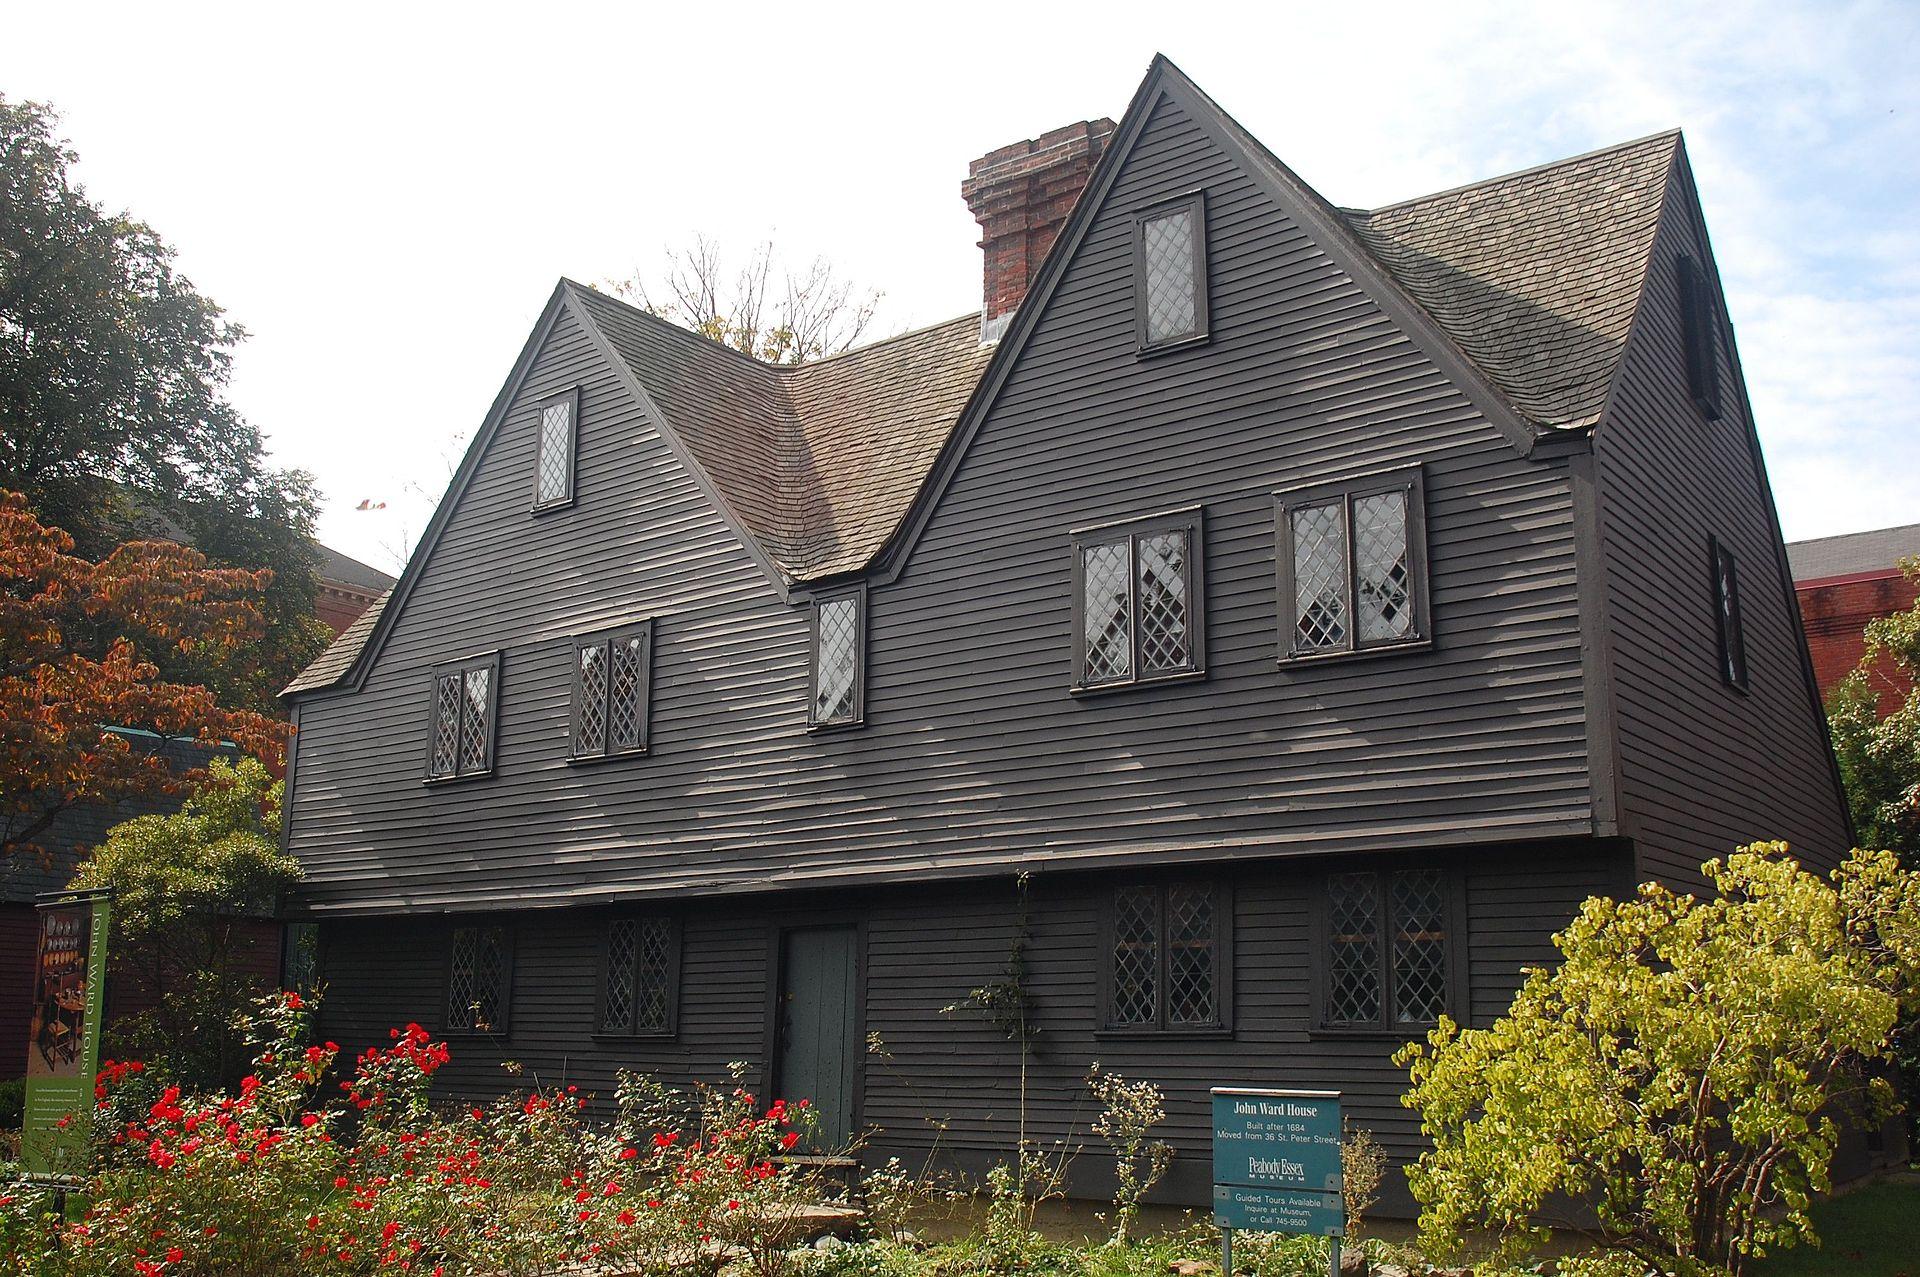 John ward house salem massachusetts wikipedia for Salem house